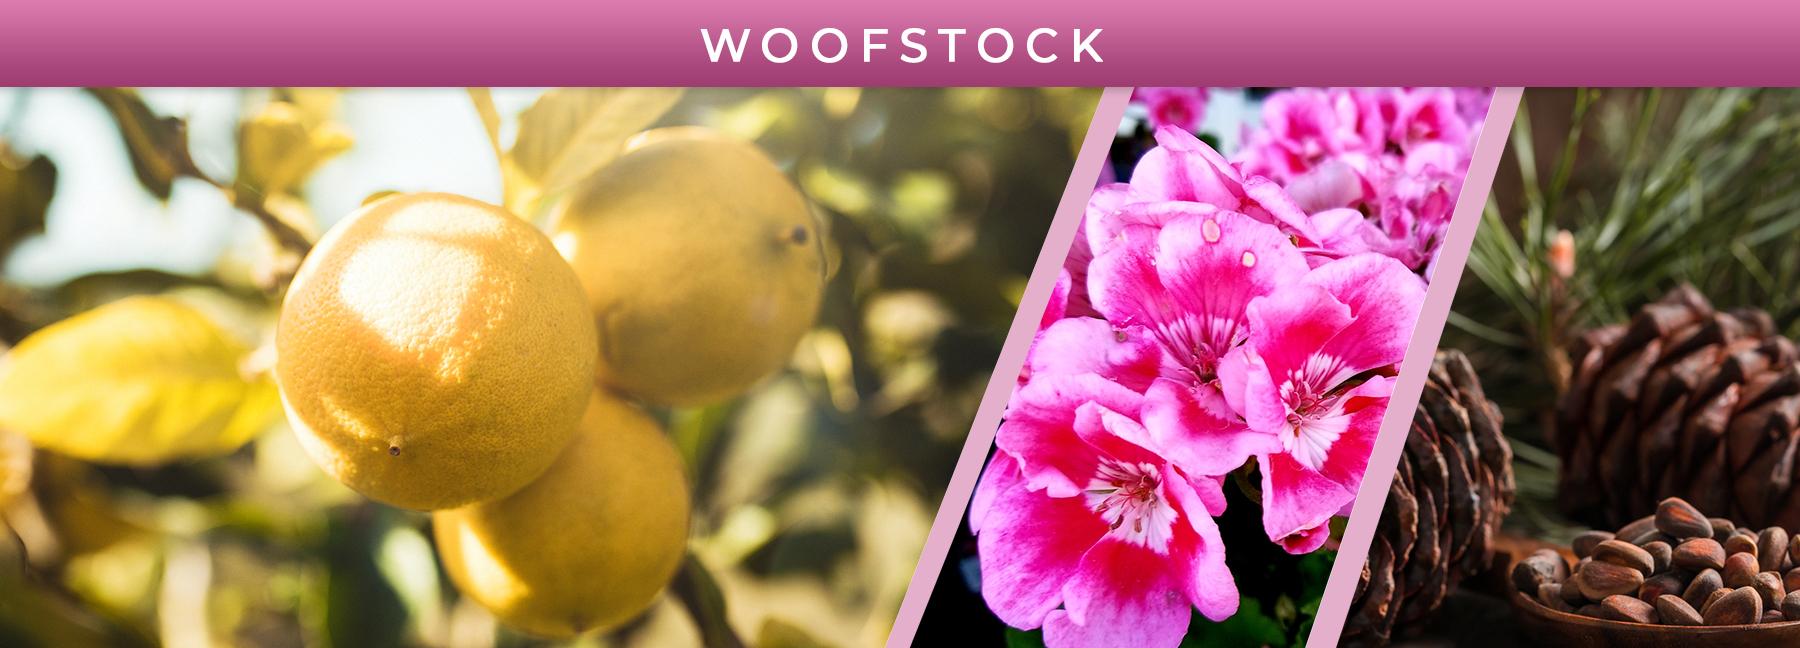 Woofstock fragrance elements